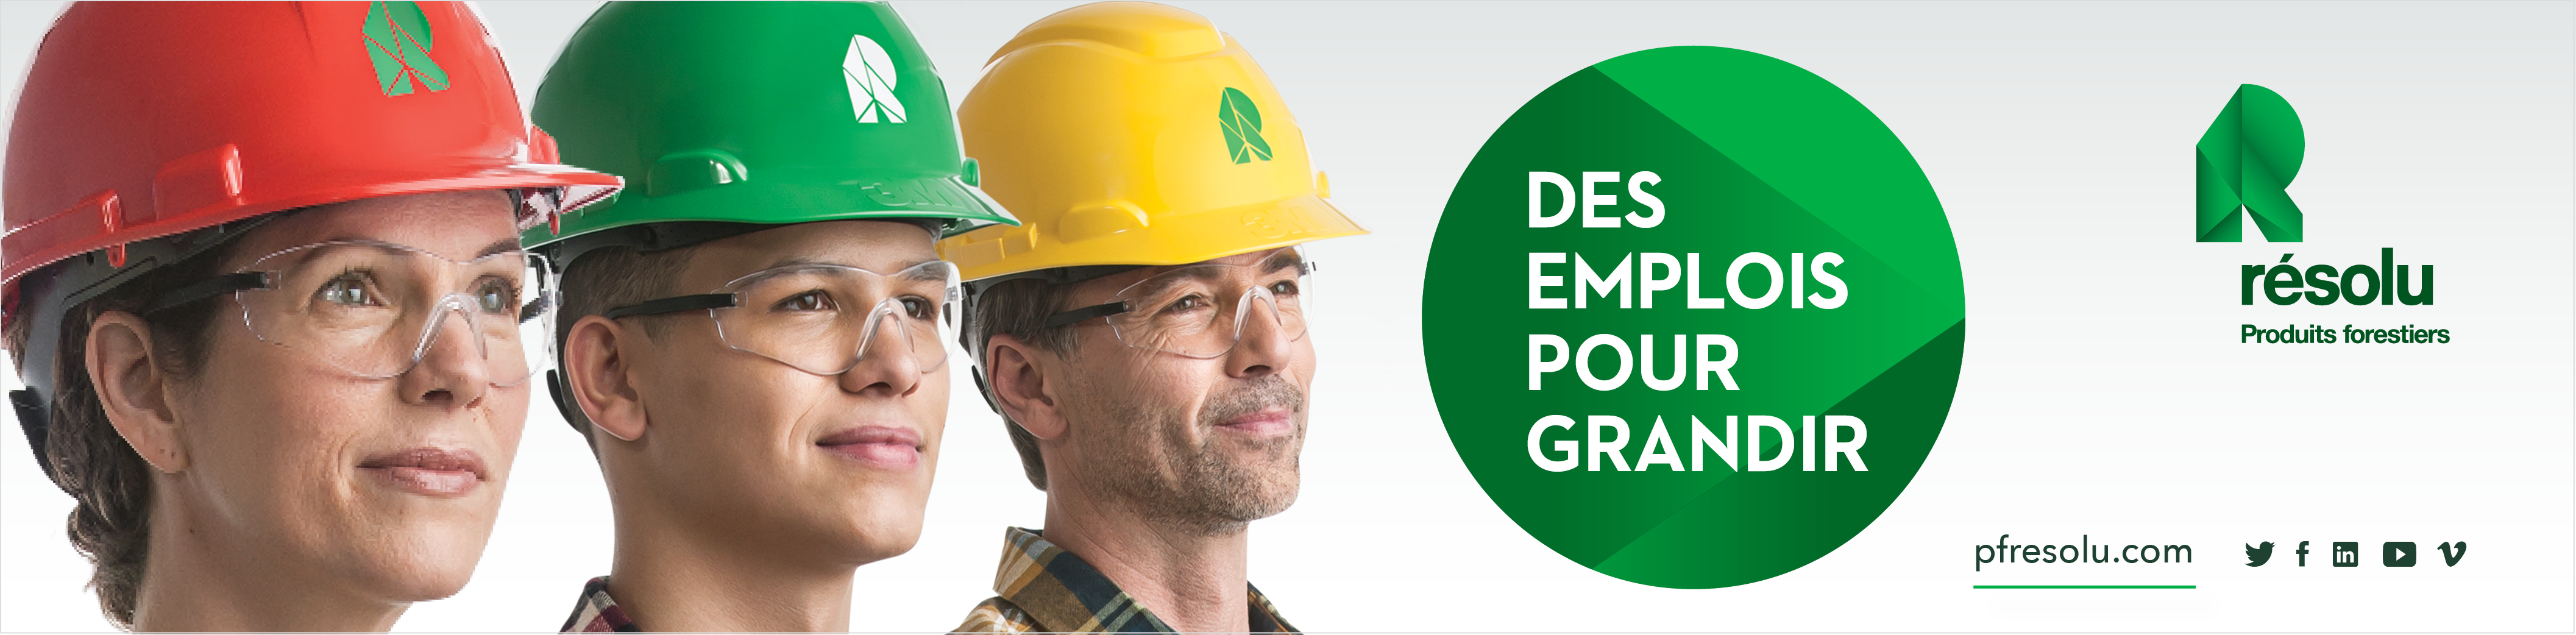 PF-Resolu-Des-emplois-pour-grandir-Logo-entreprise